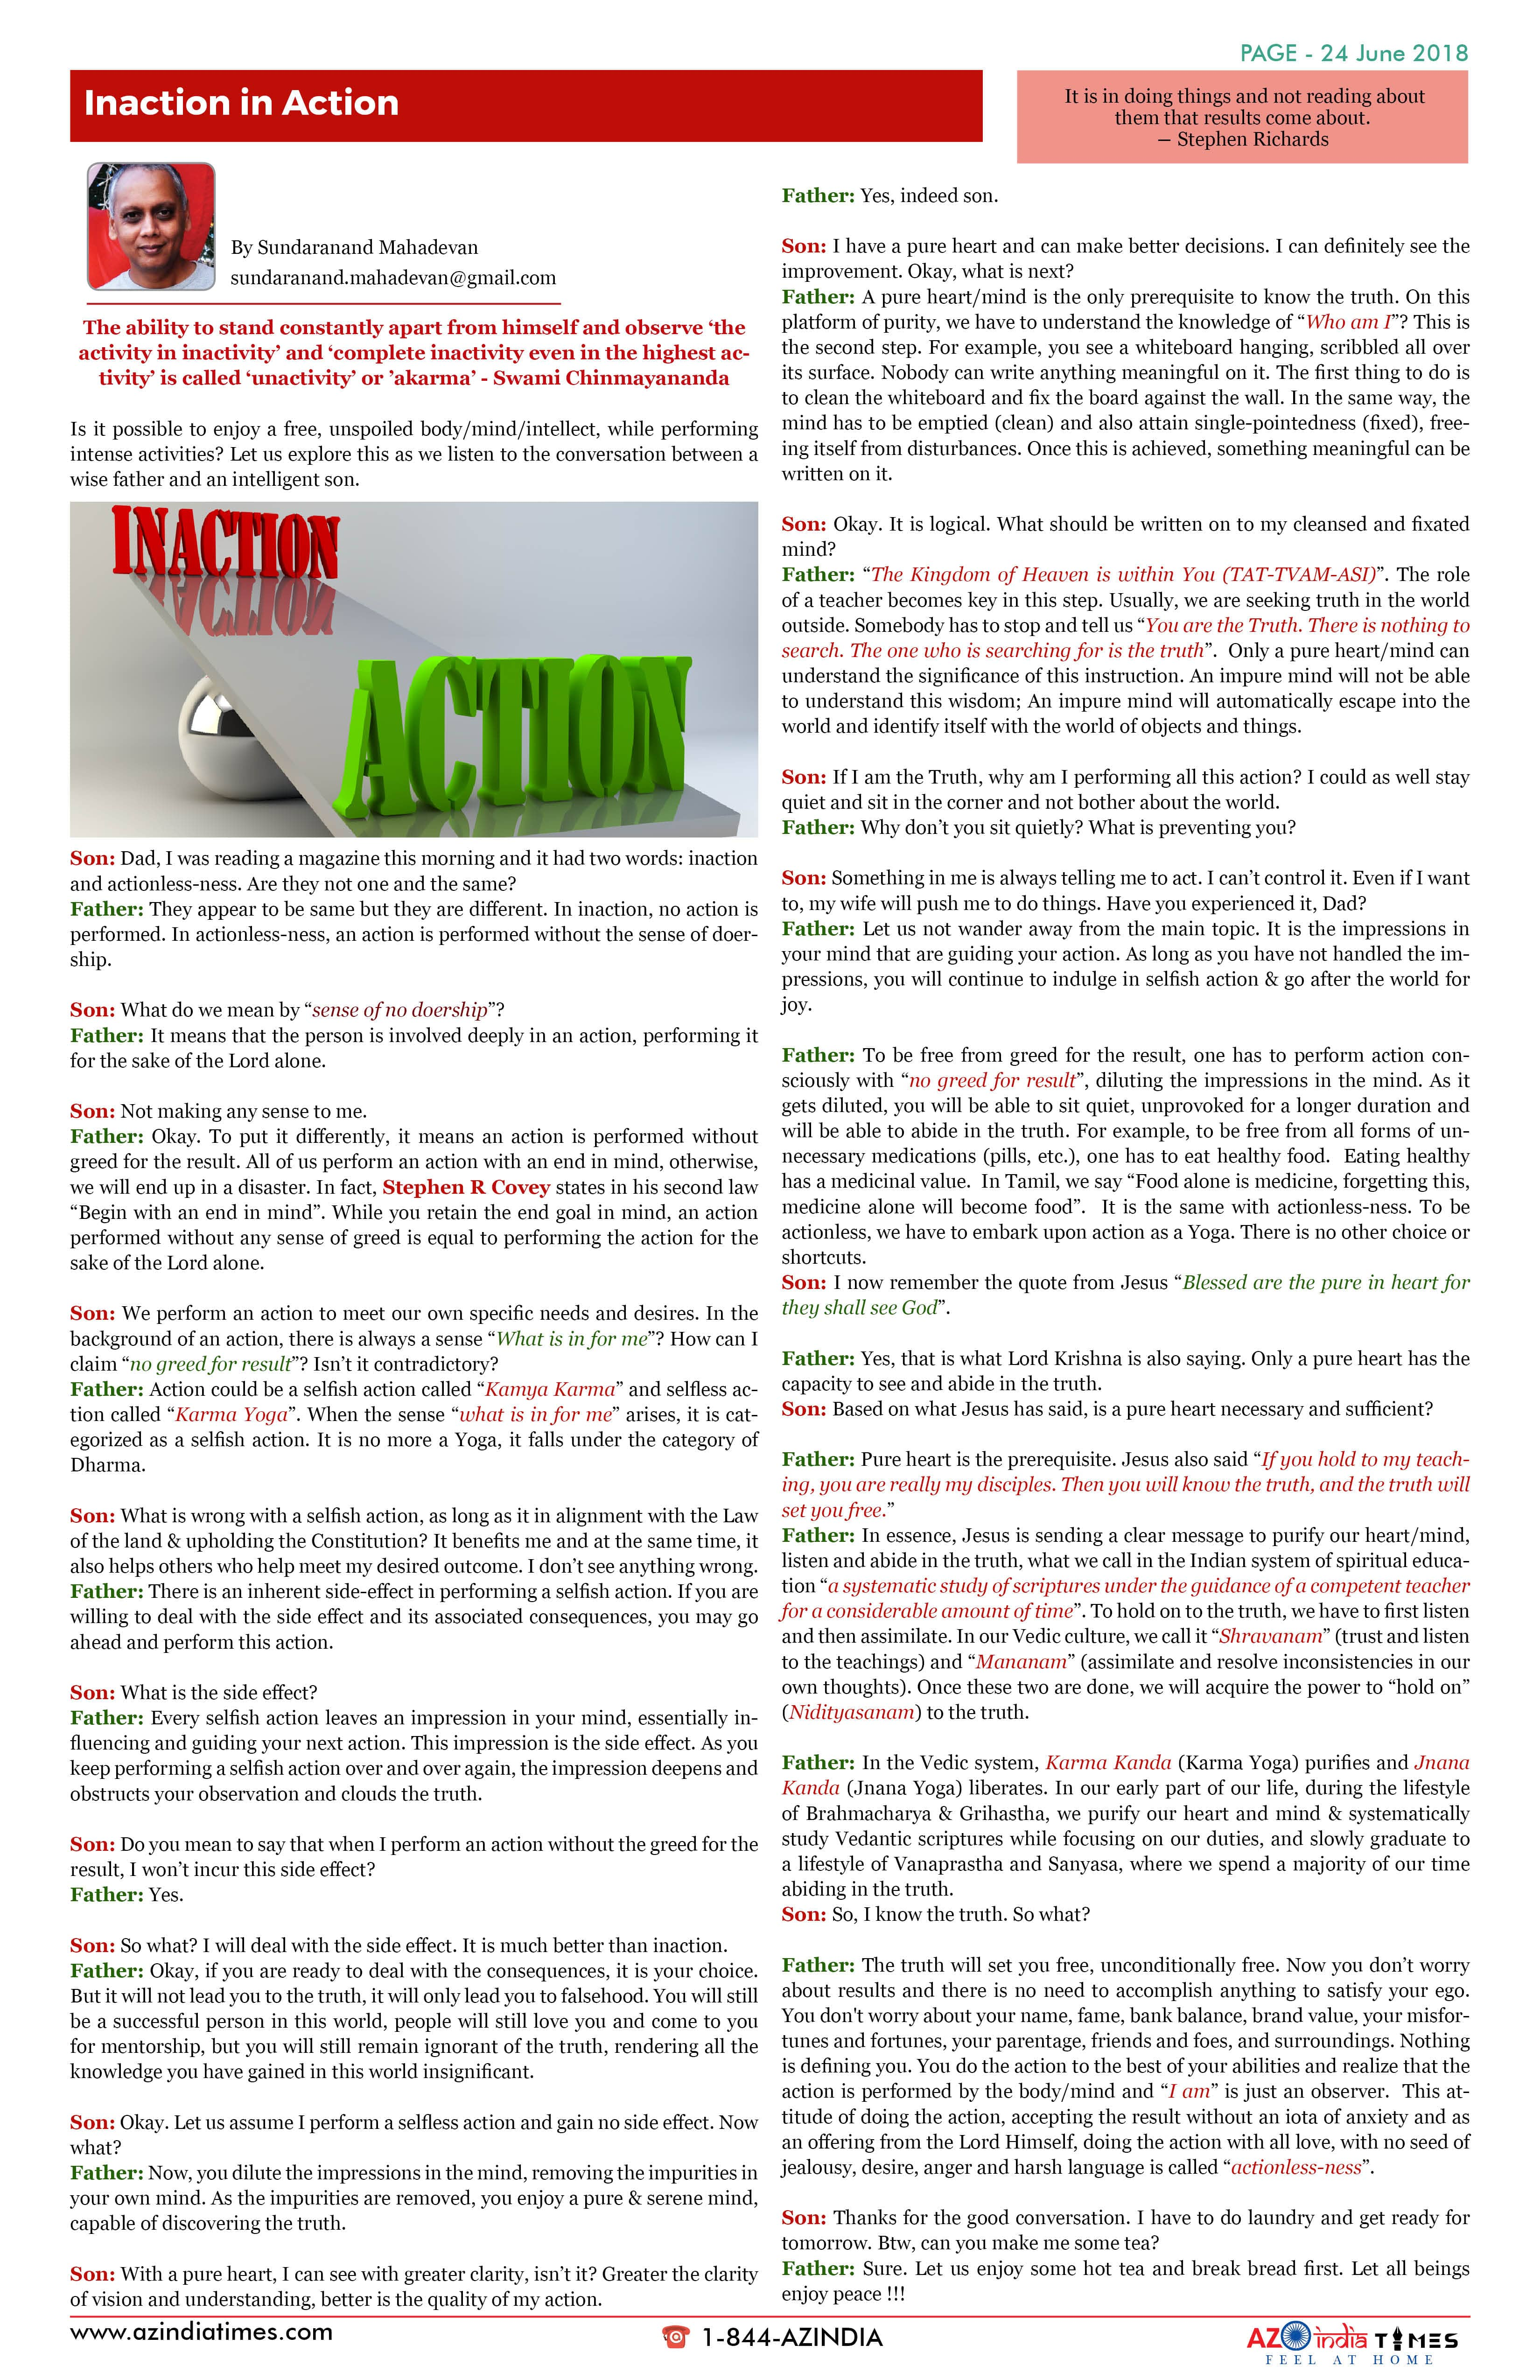 AZ INDIA JUNE EDITION 24